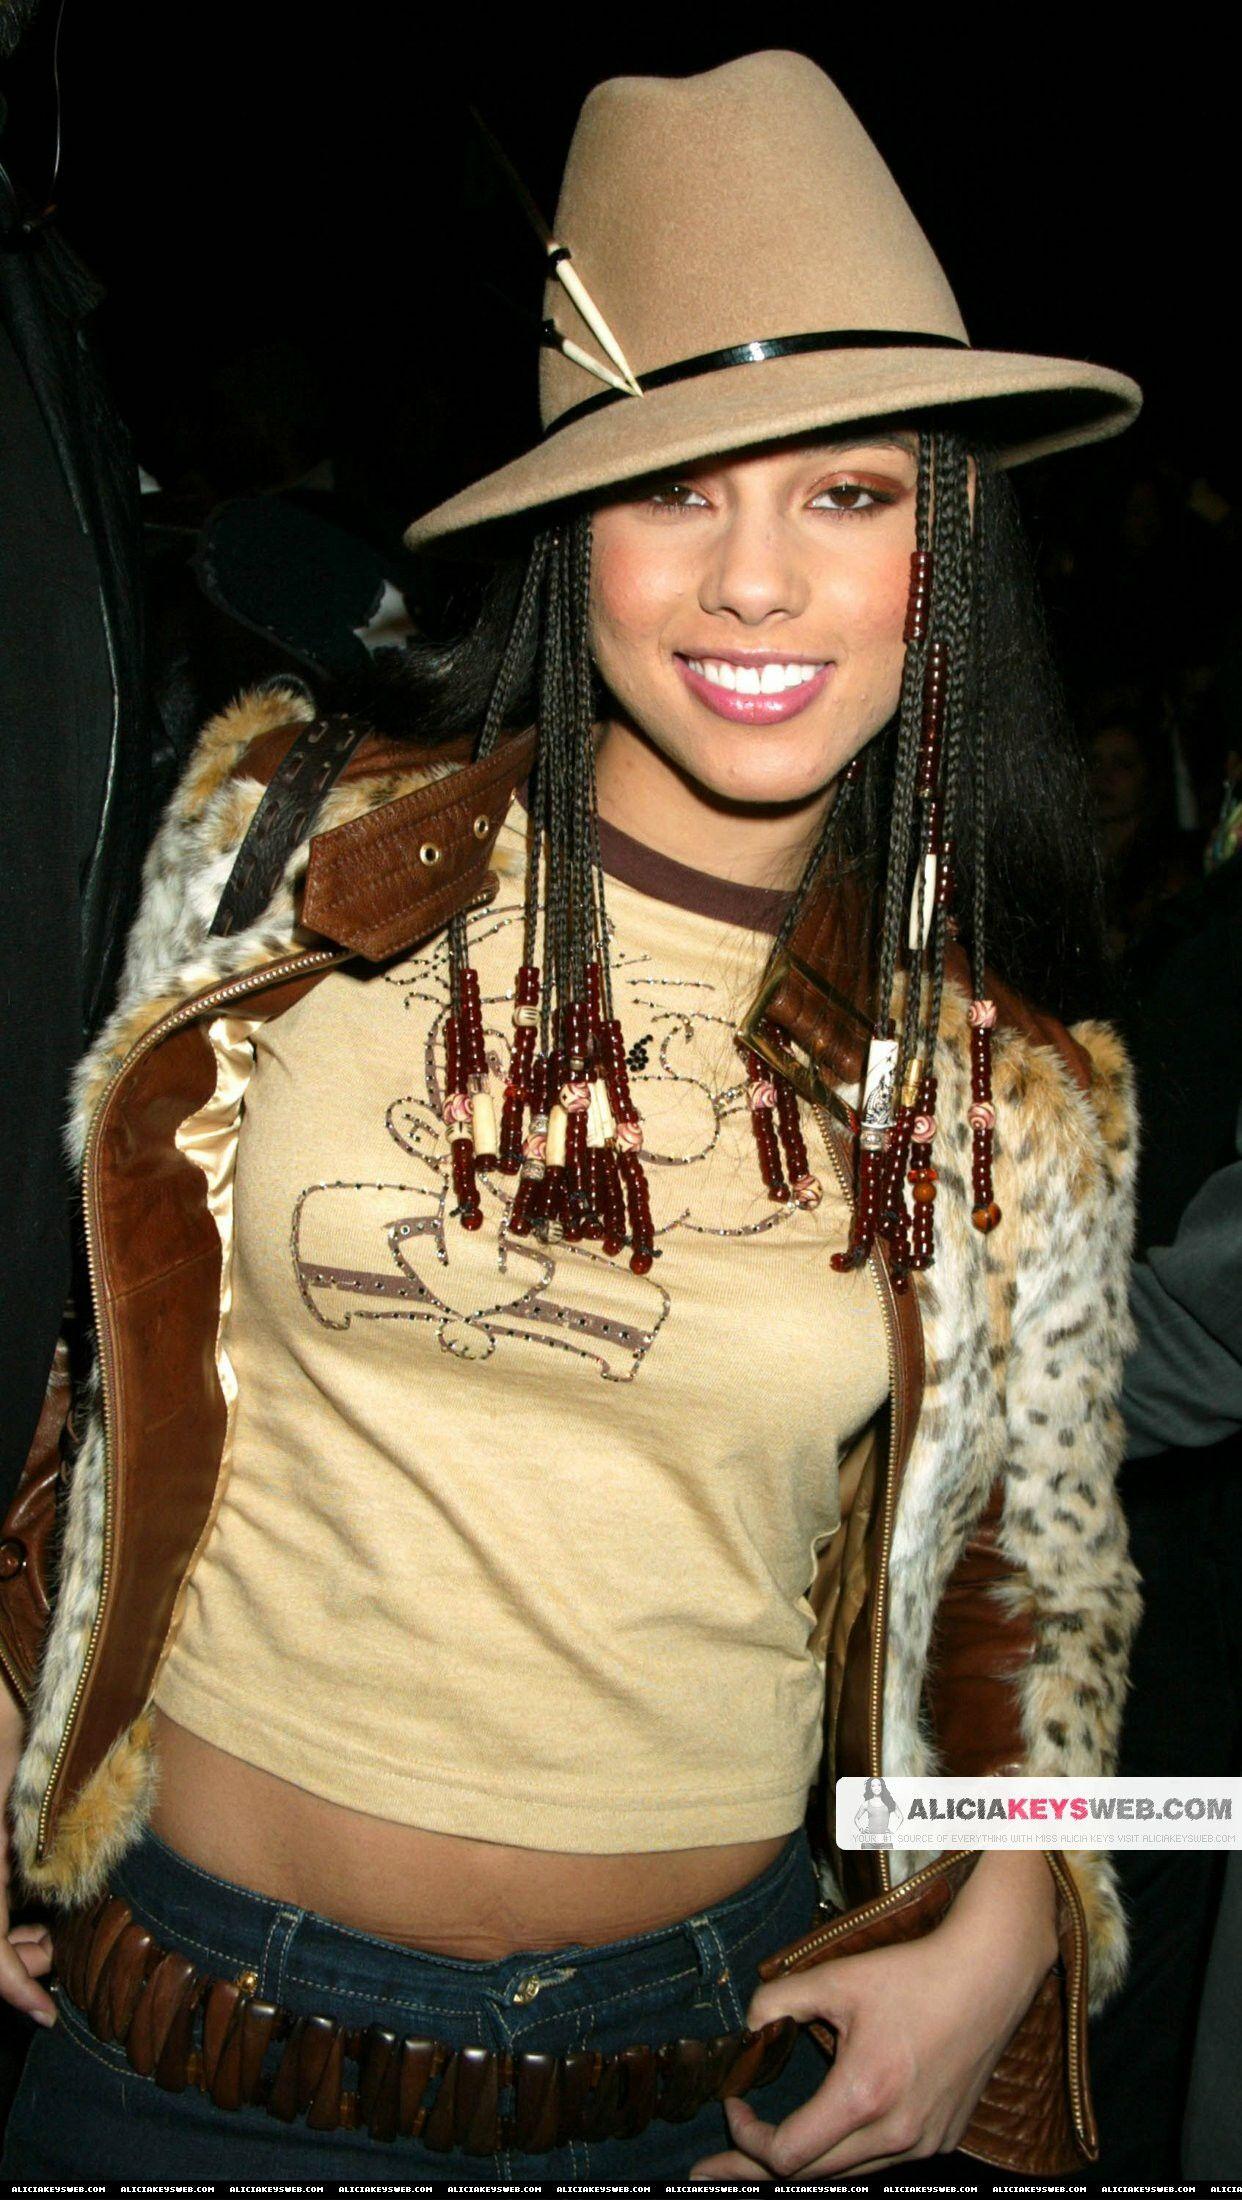 Alicia Keys Divas of R&B, HipHop, Soul, Country, Rock